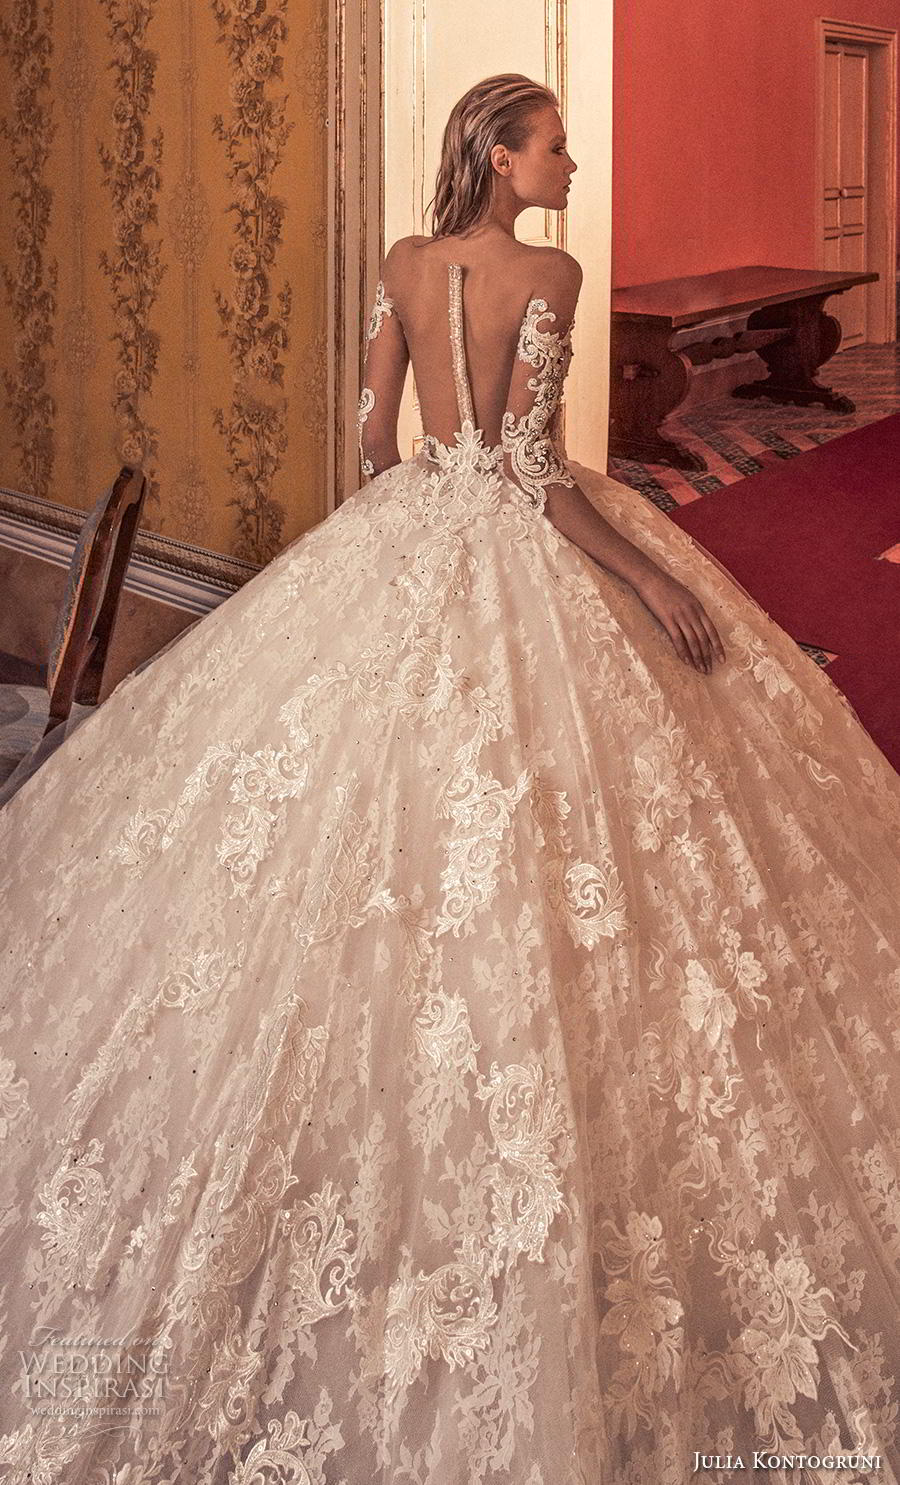 julia kontogruni 2019 bridal long sleeves sweetheart neckline heavily embellished bodice ball gown a  line wedding dress sheer button back royal train (9) zbv